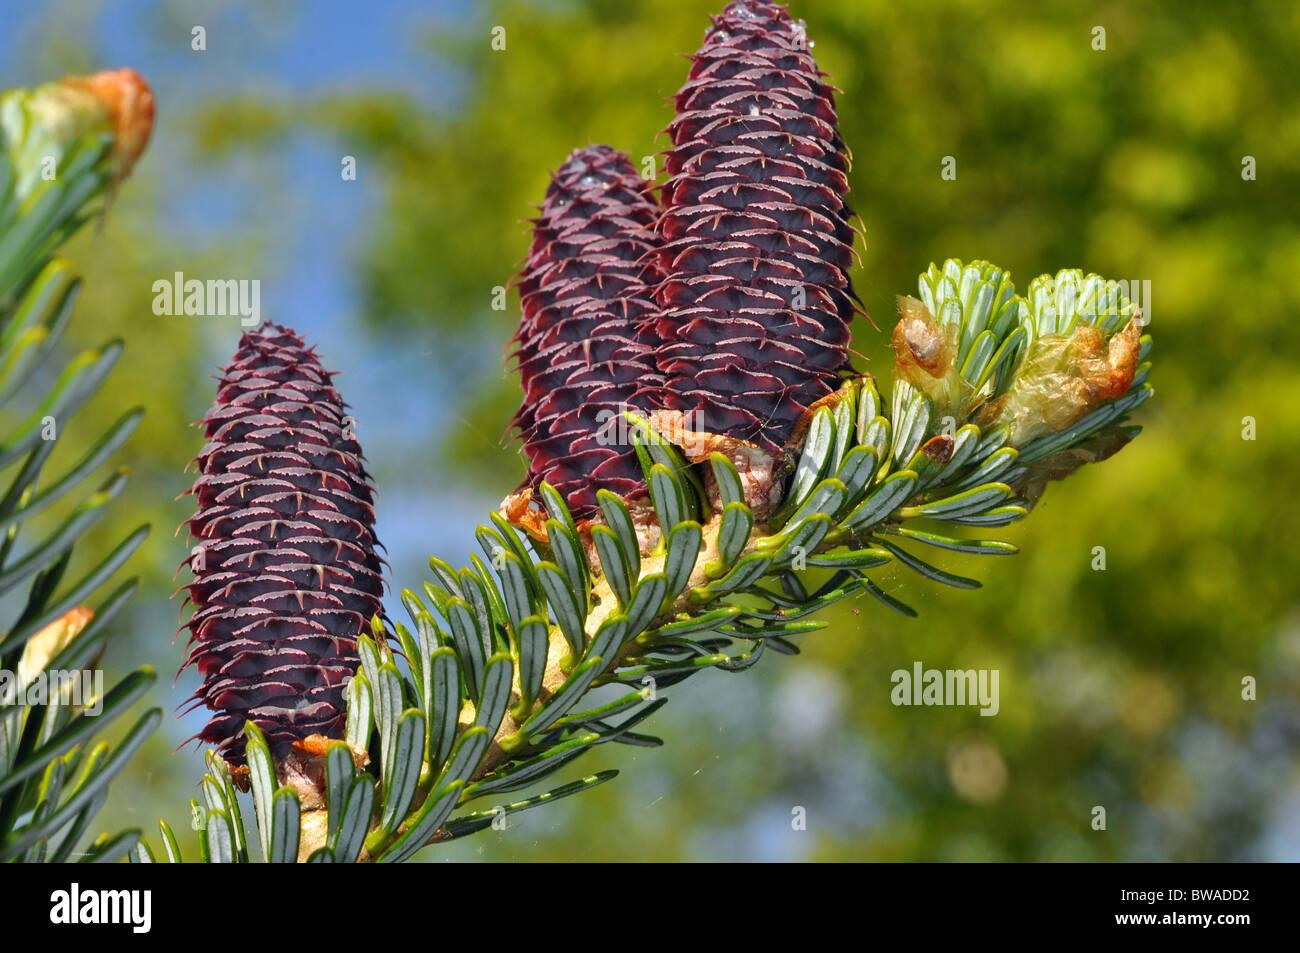 Abies koreana Blue cone fir - Stock Image